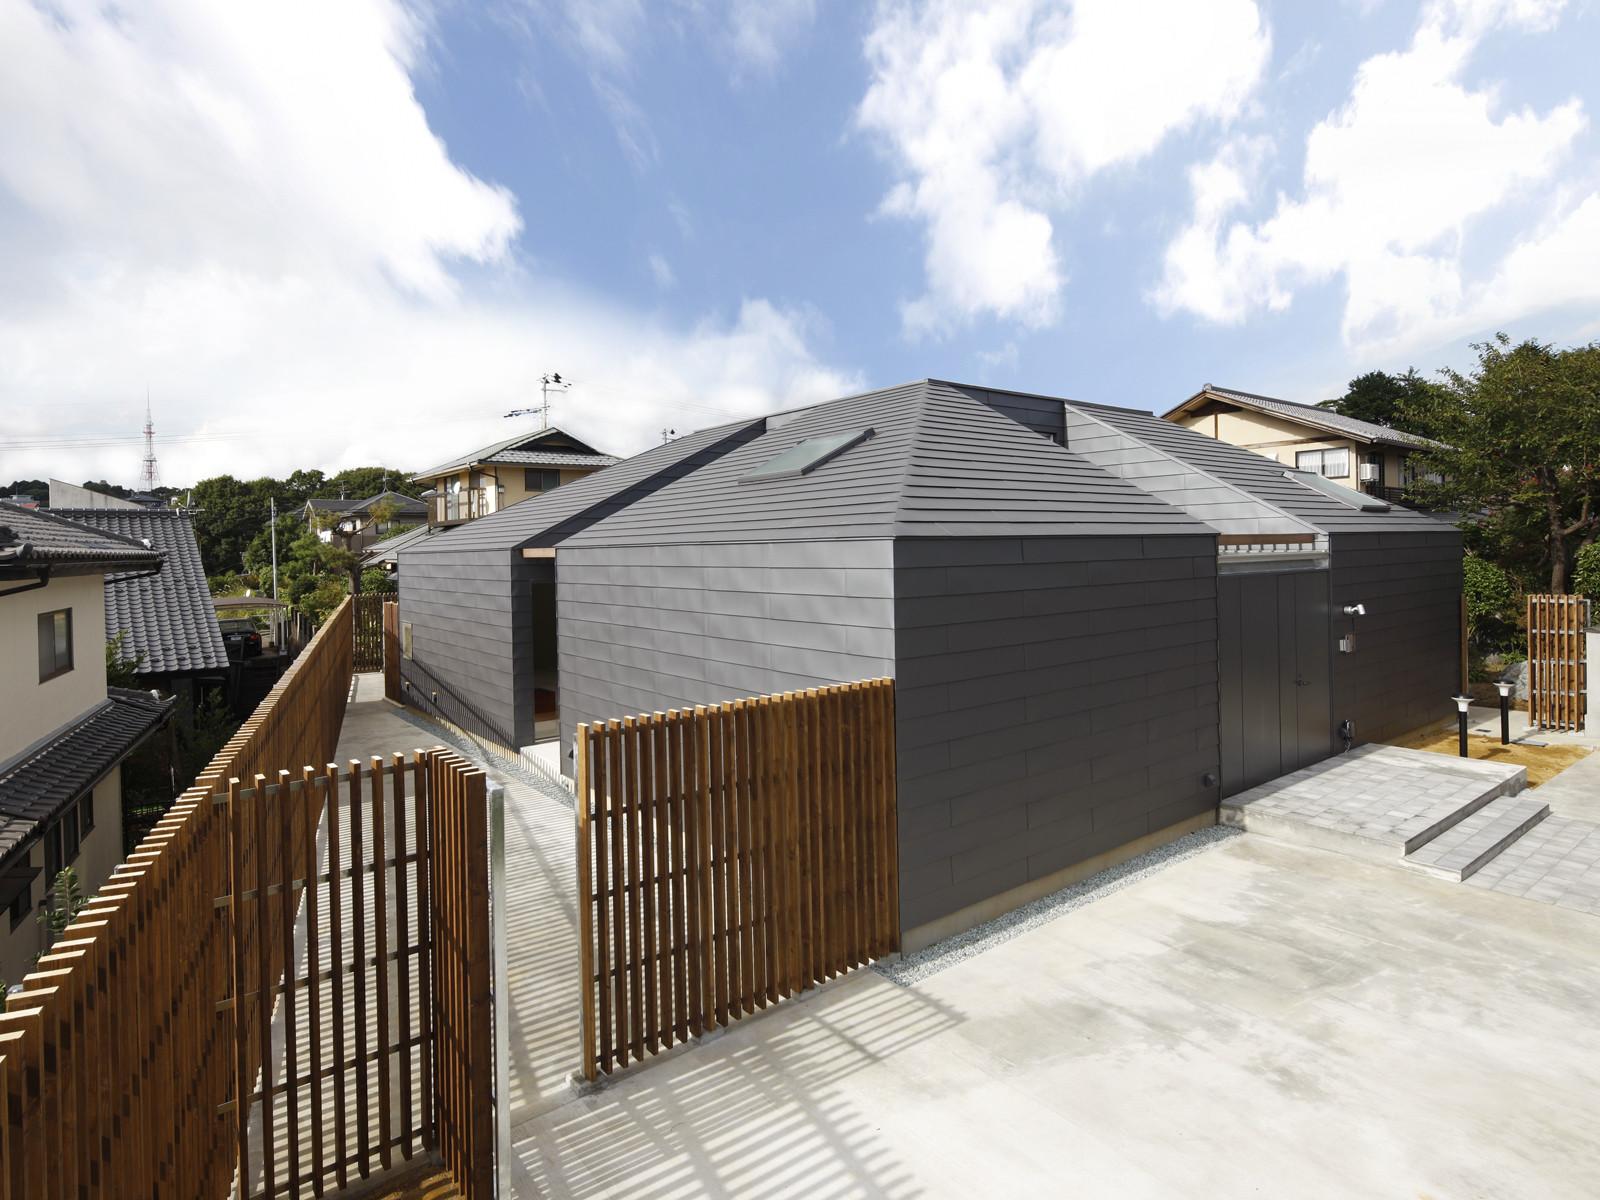 House Yagiyama / Kazuya Saito Architects, © Yasuhiro Takagi